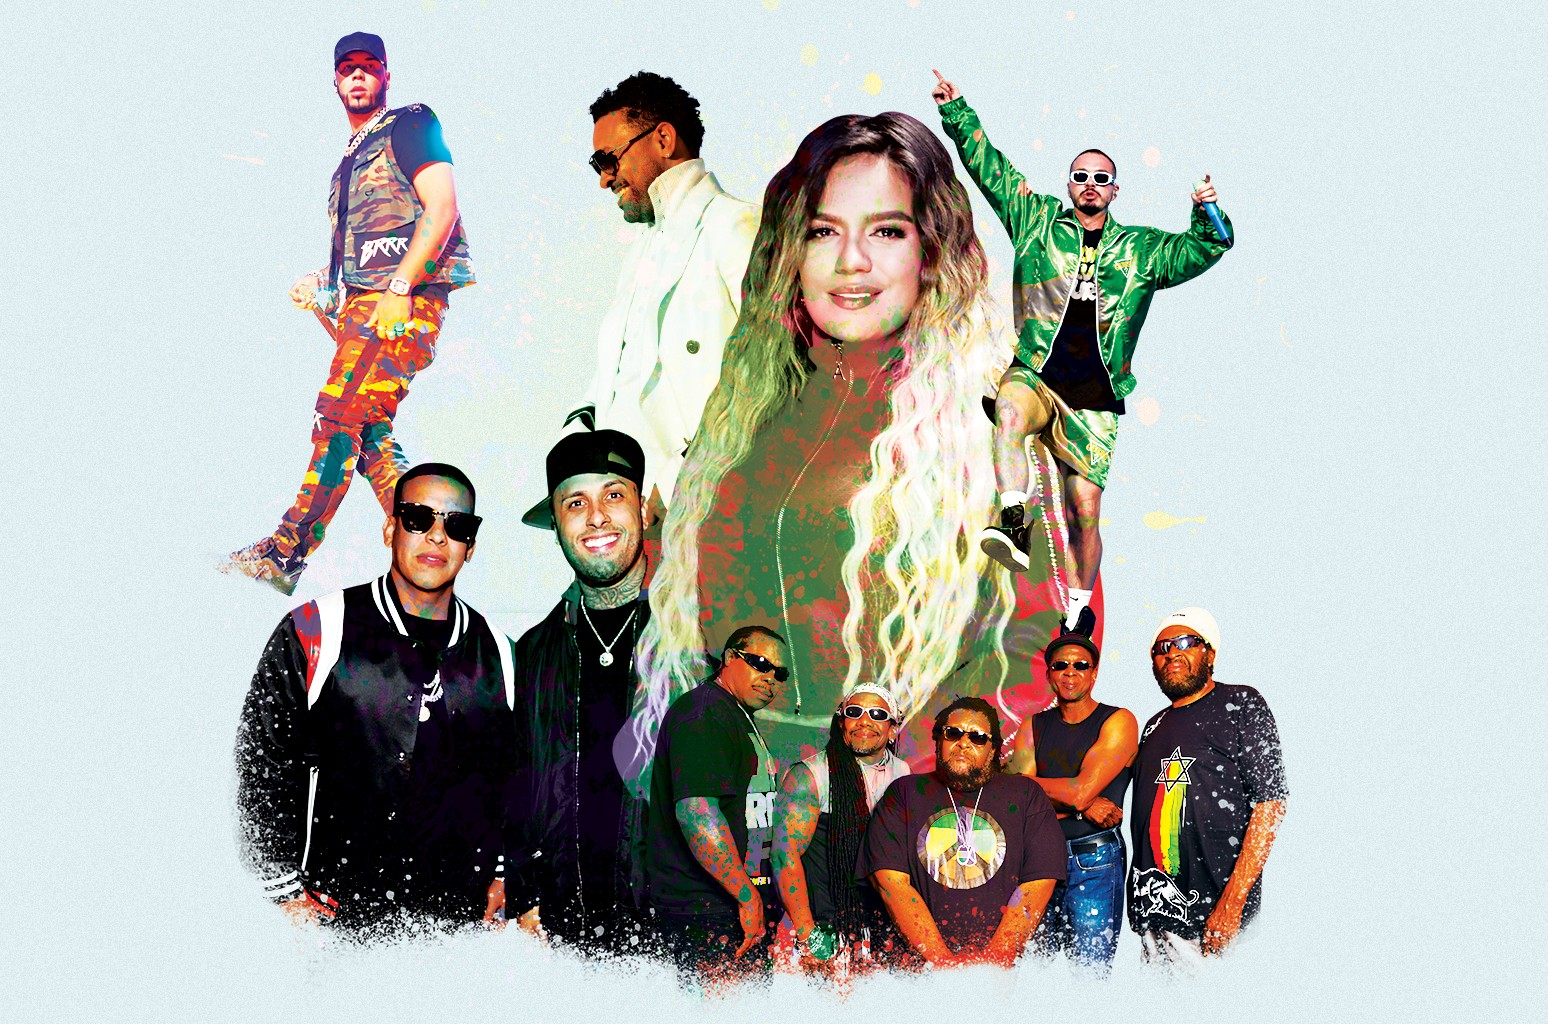 AnuelAA, Shaggy, KarolG, J Balvin, Inner Circle, Nicky Jam and Daddy Yankee